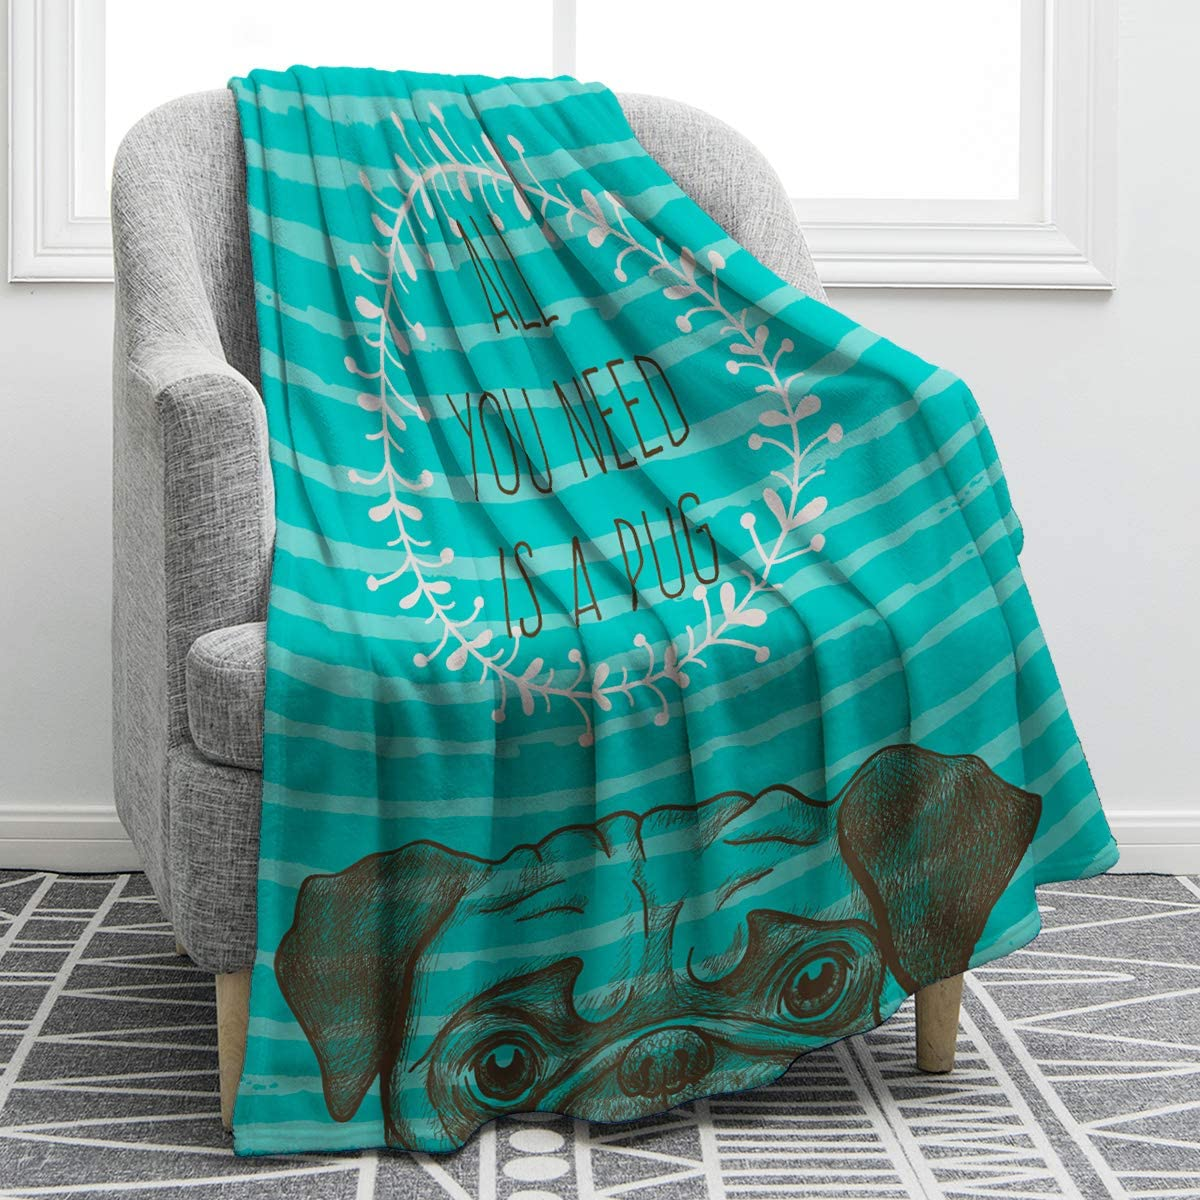 3. Pug Dog - Soft & Smooth Throw Blanket